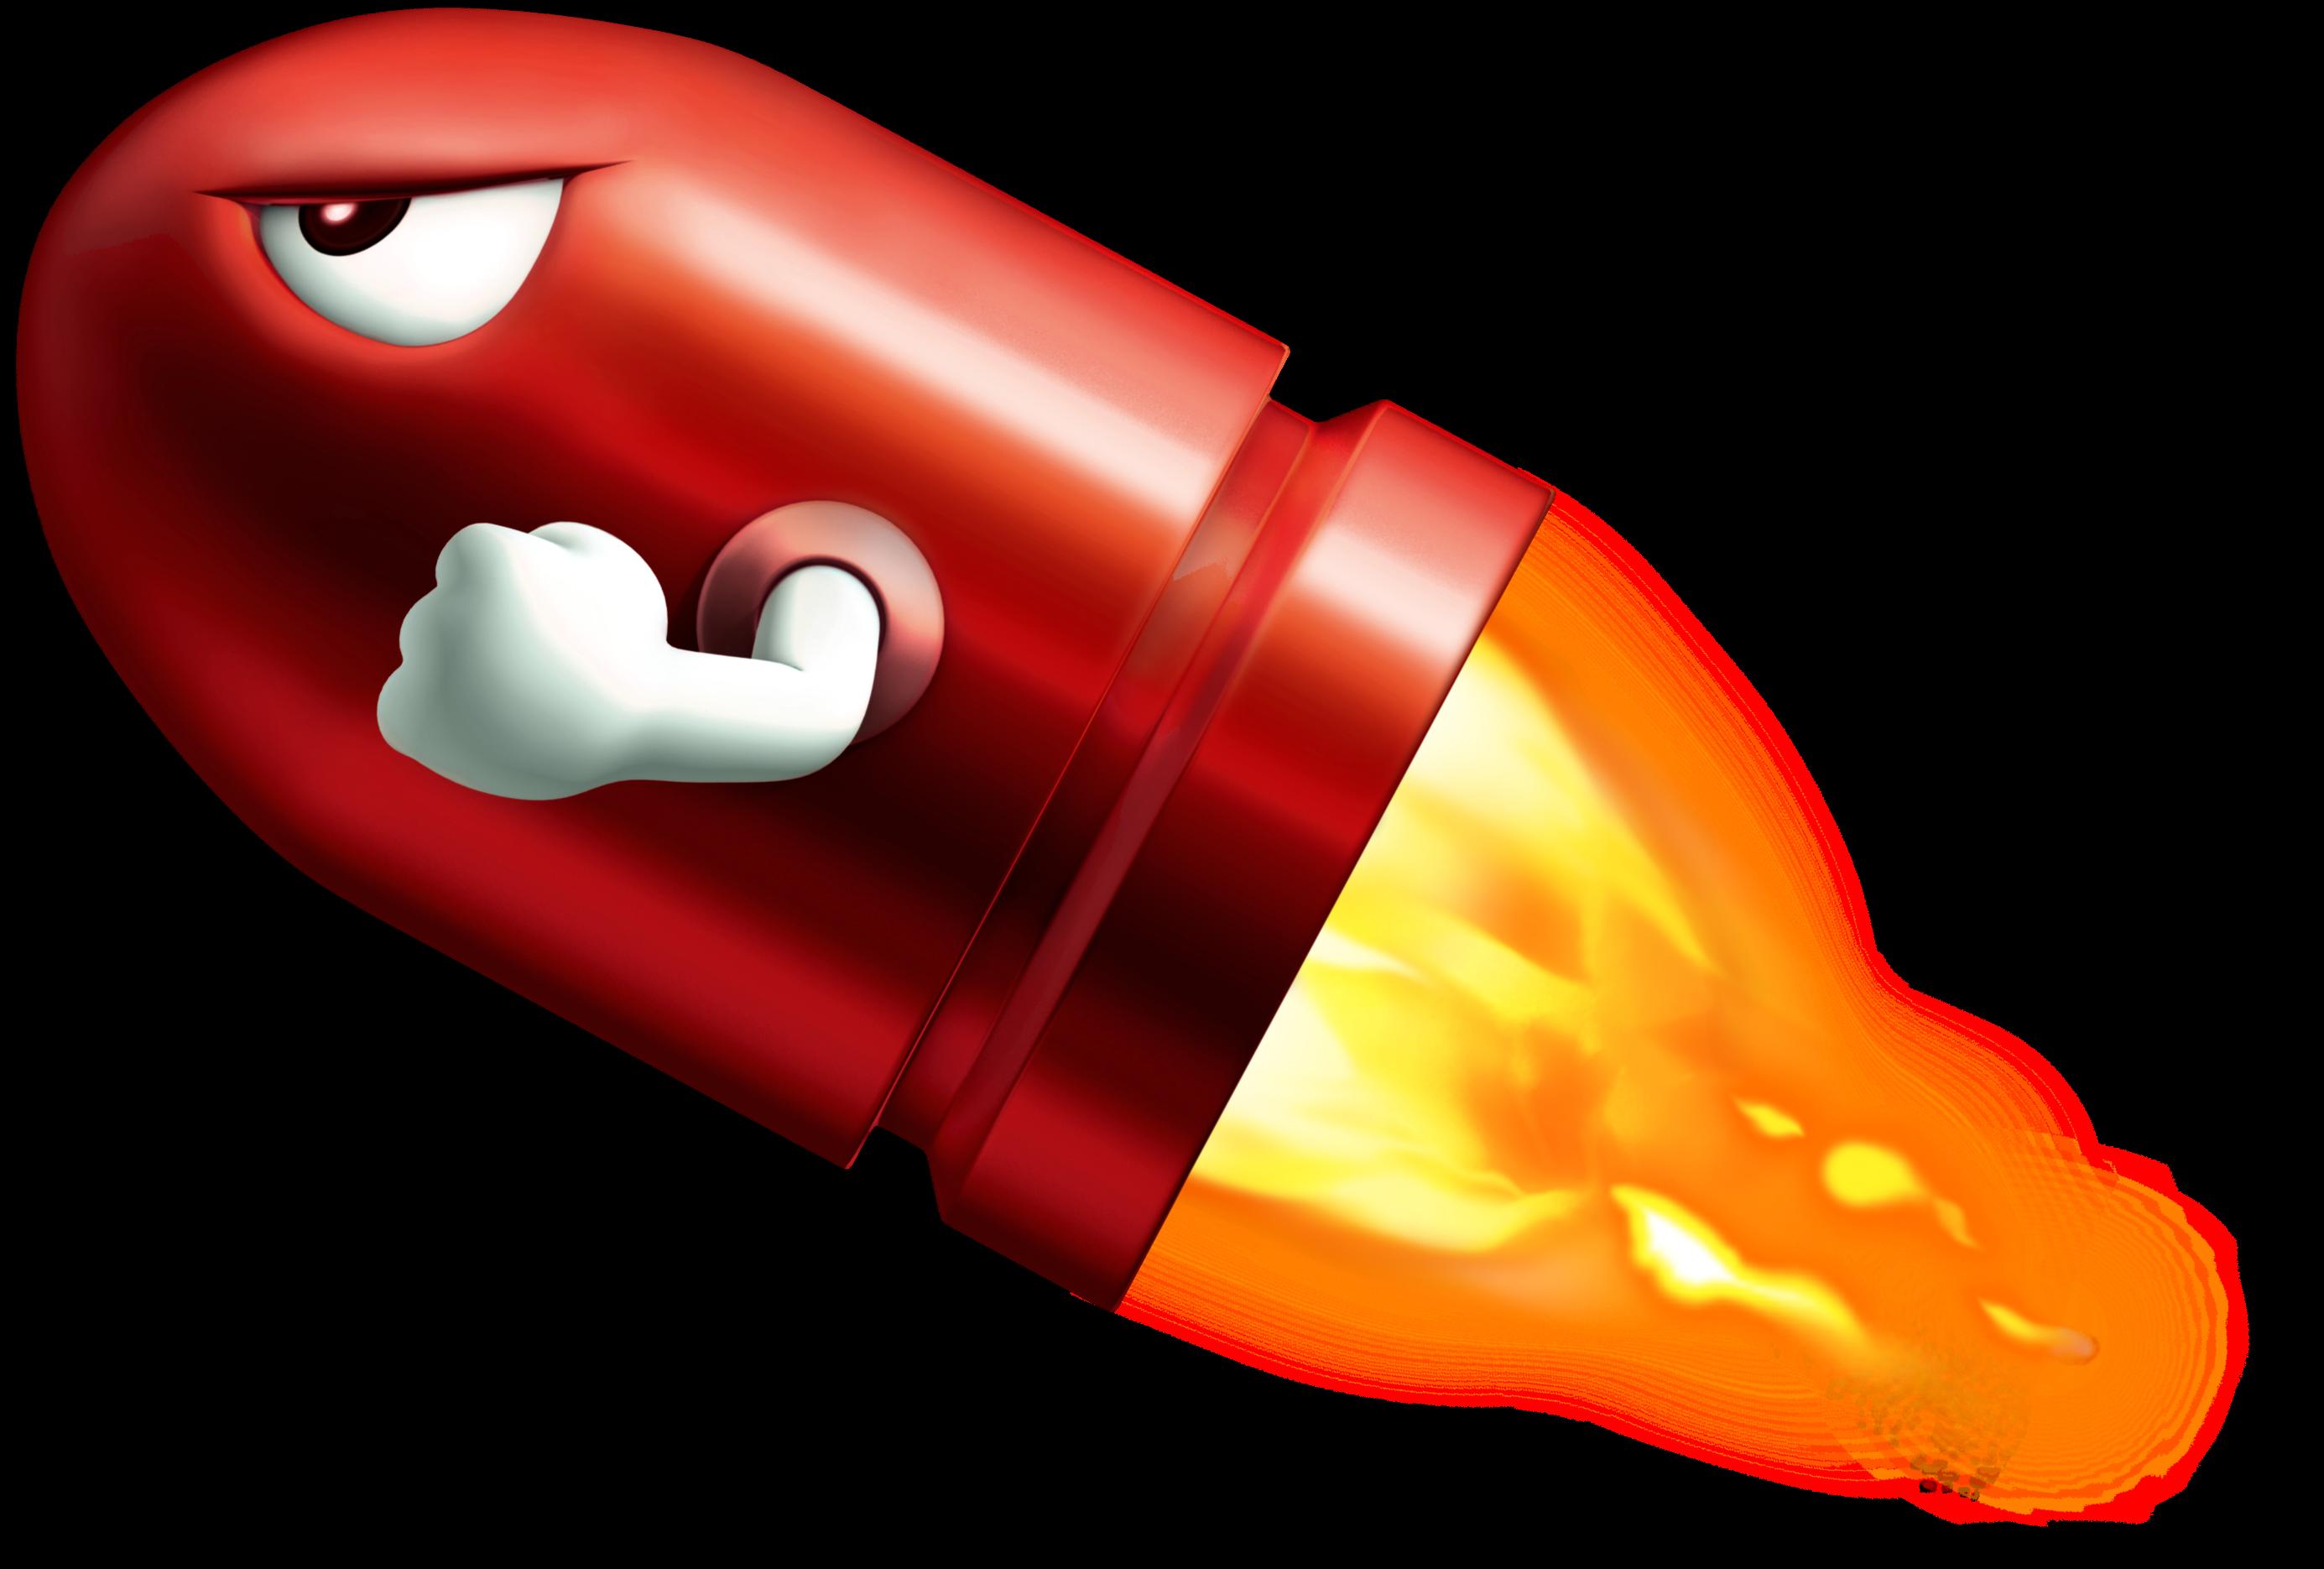 Missile clipart bullet 45 Usertendo FANDOM powered by